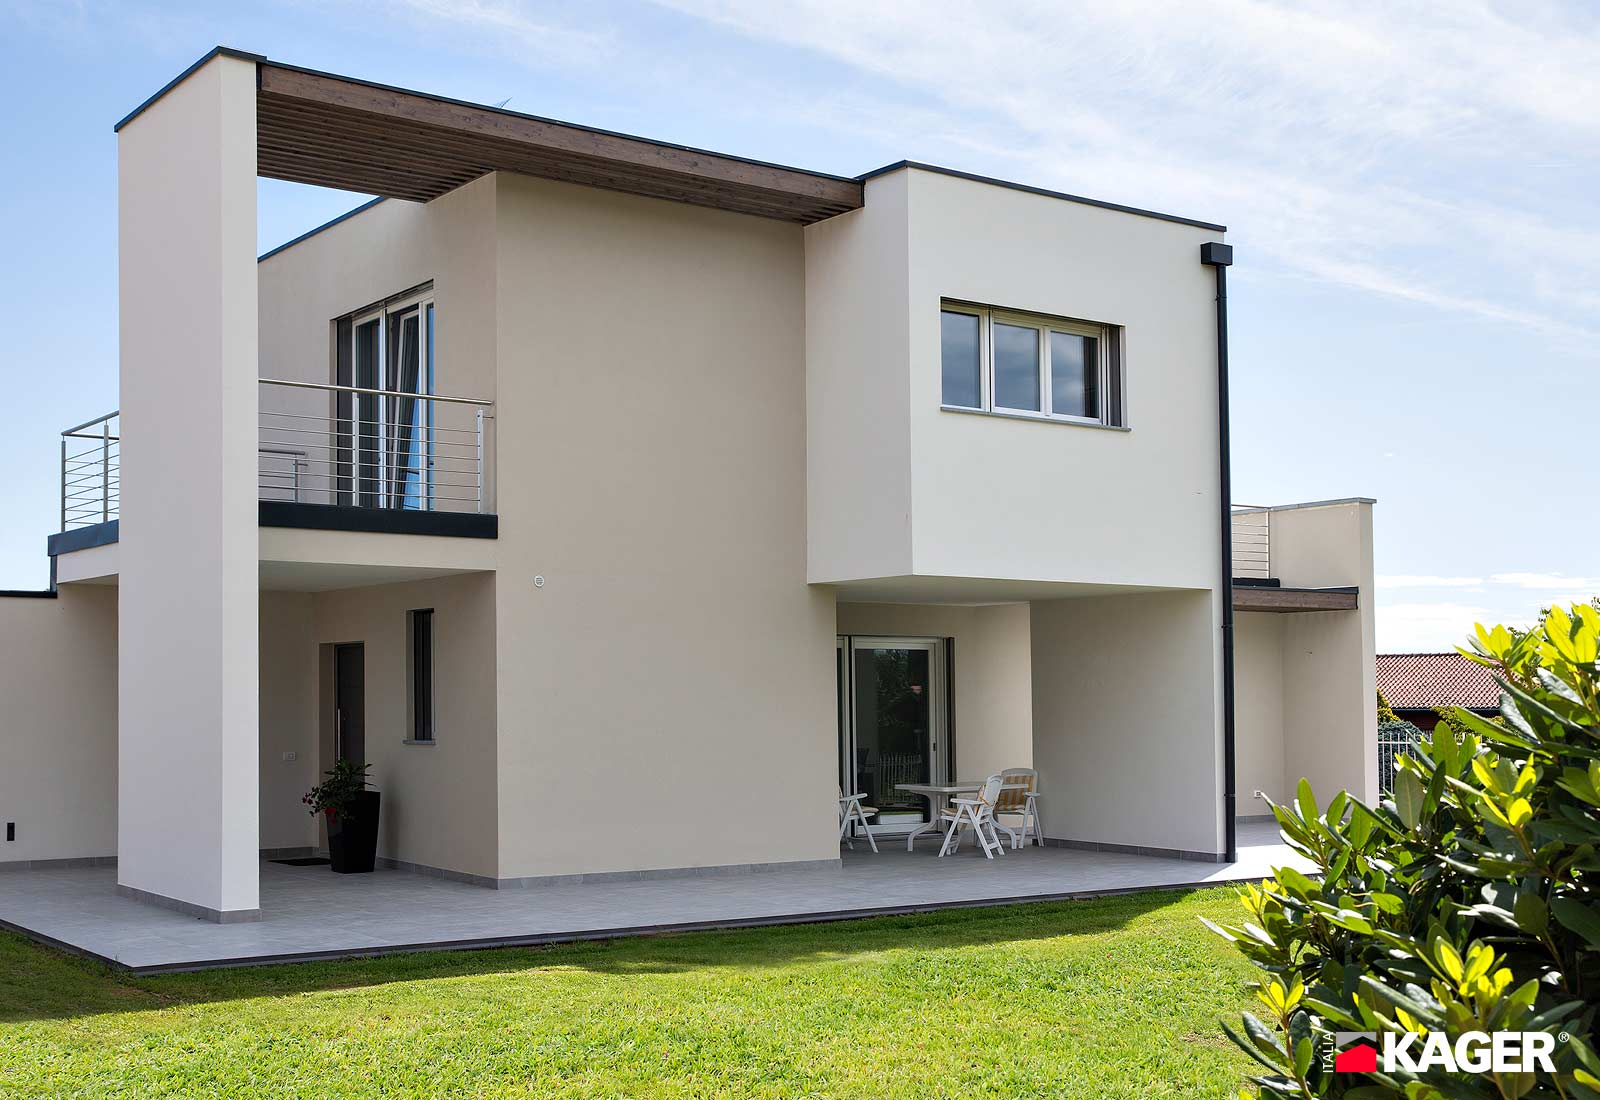 Casa-in-legno-Boca-Novara-Kager-Italia-04